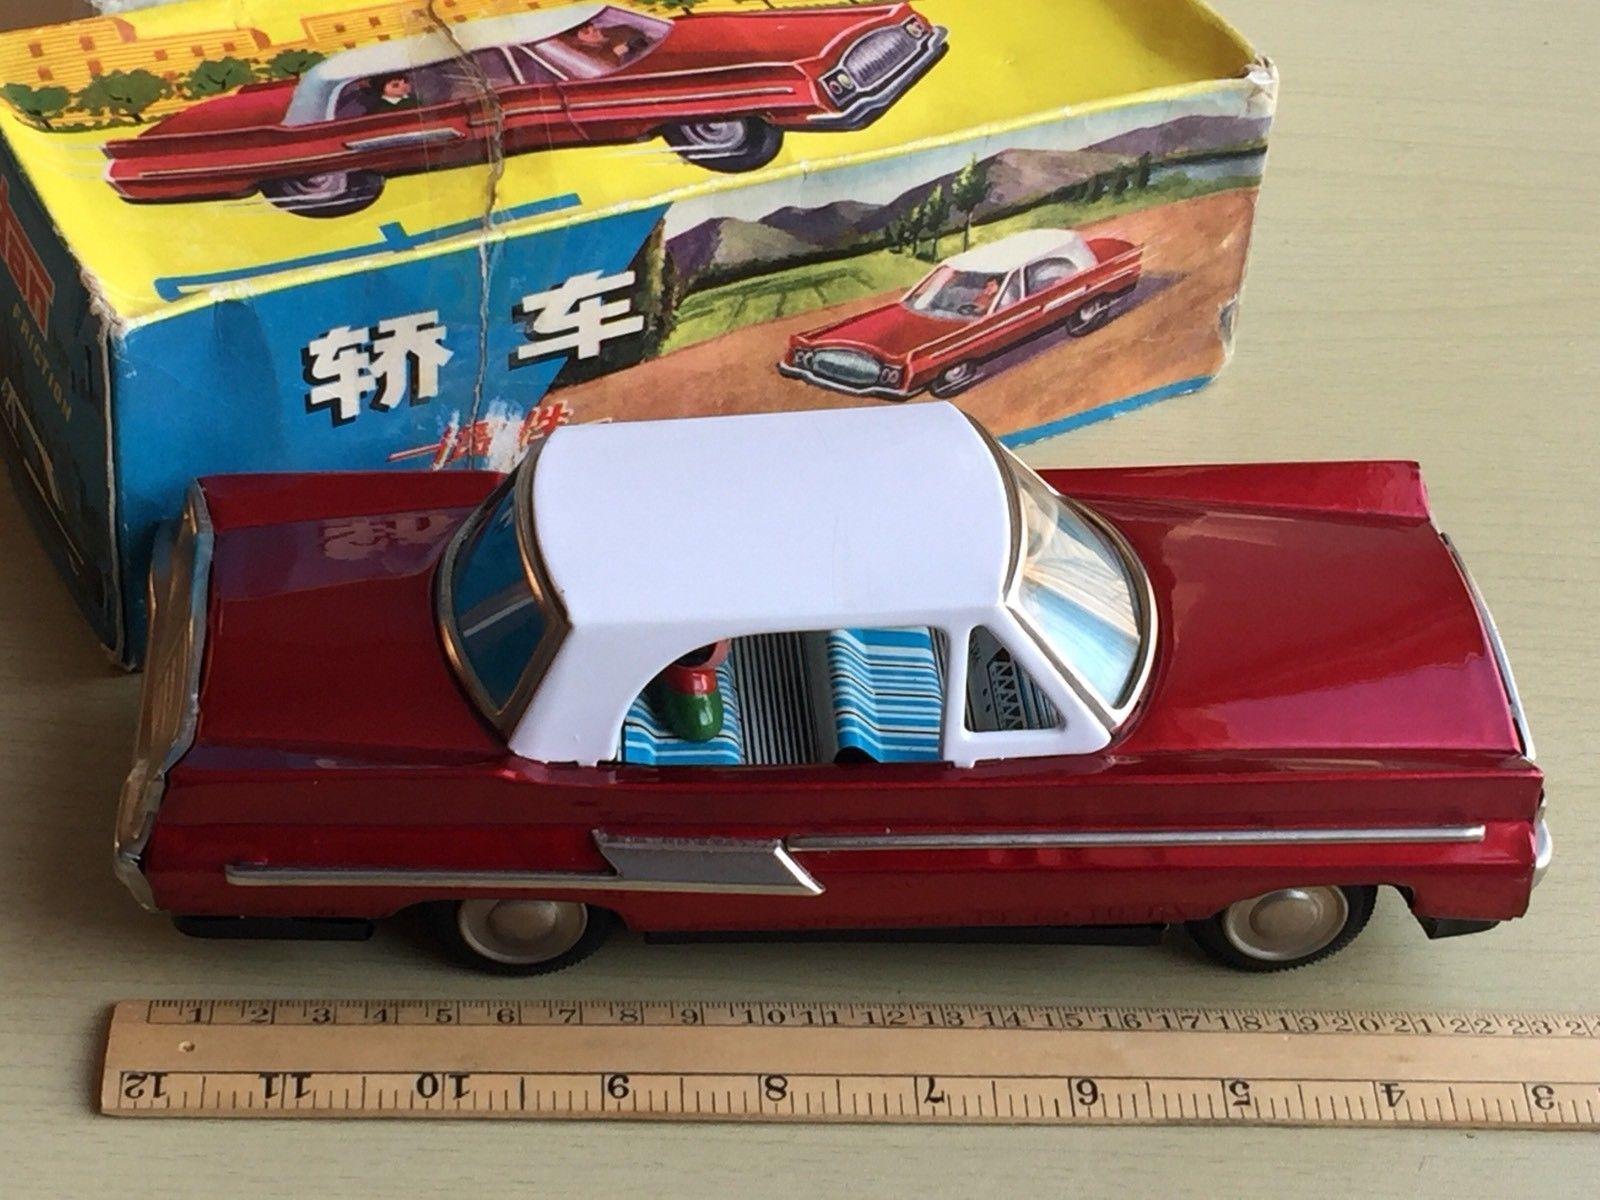 Toys car images  MF Vintage China Tinplate Friction Toy Car  Tin toys